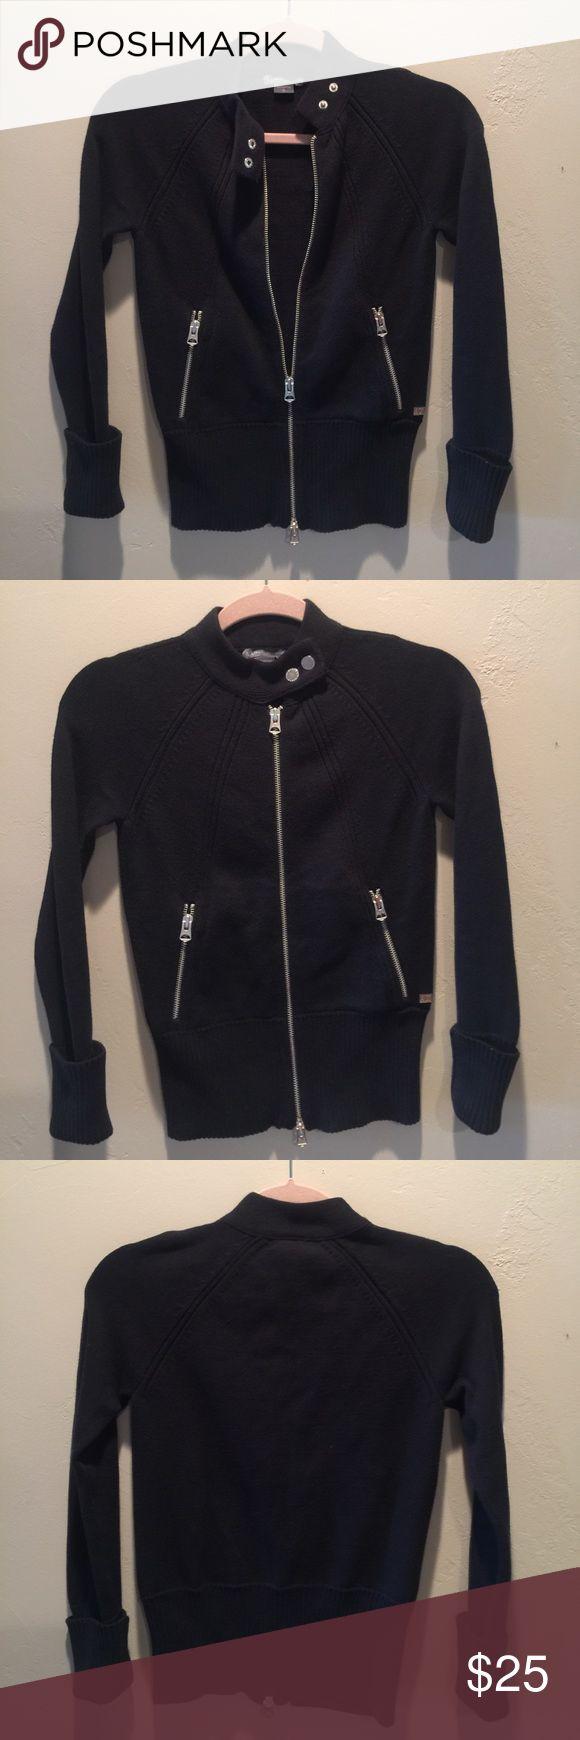 "Armani Exchange Moto Cardigan Black XS NWOT Armani Cardigan in Moto style w/ Armani embellished buttons & zipper pulls. 13""L from underarm. Size XS 0/2 Armani Exchange Sweaters Cardigans"